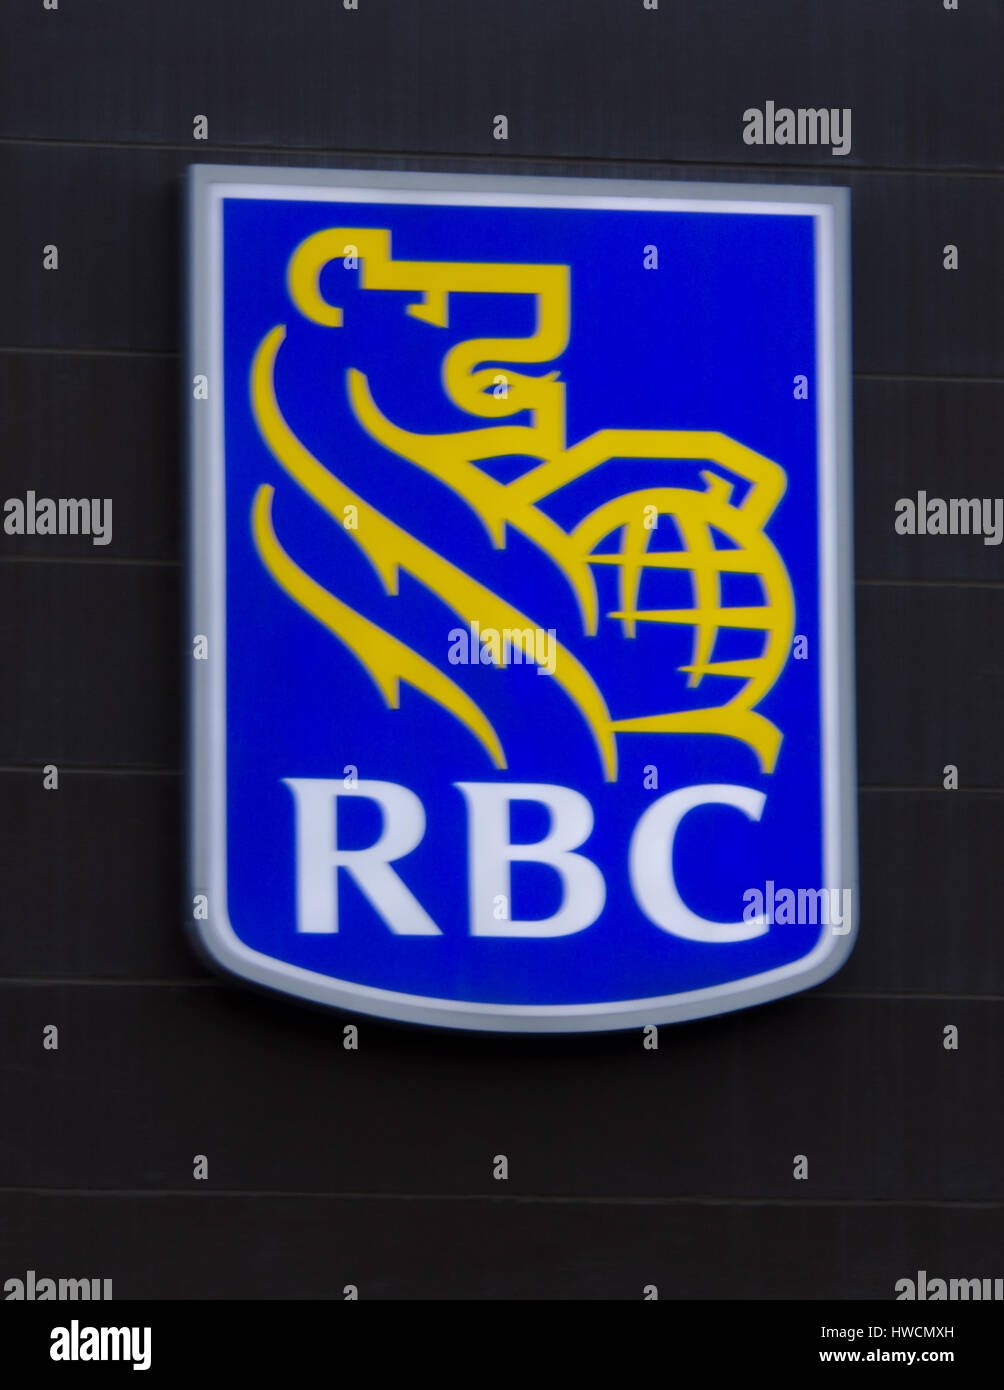 A Royal Bank of Canada (RBC) logo in Calgary, Alberta, Canada. - Stock Image